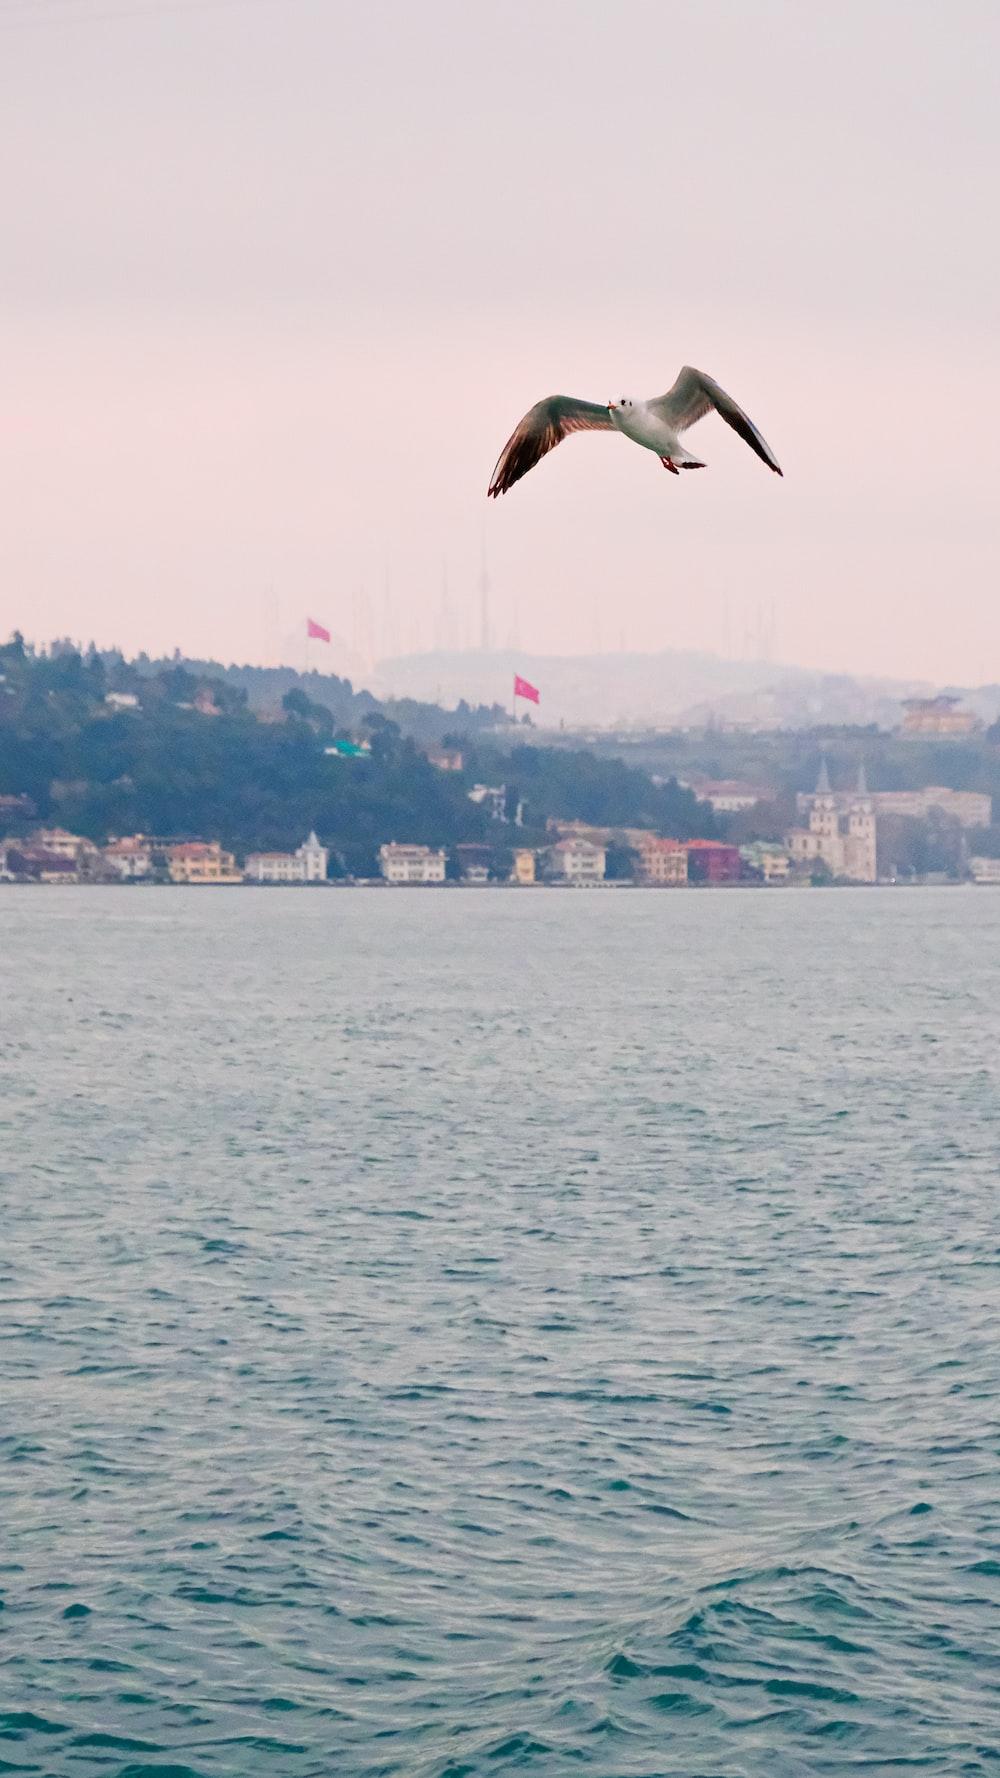 white bird flying over the city during daytime